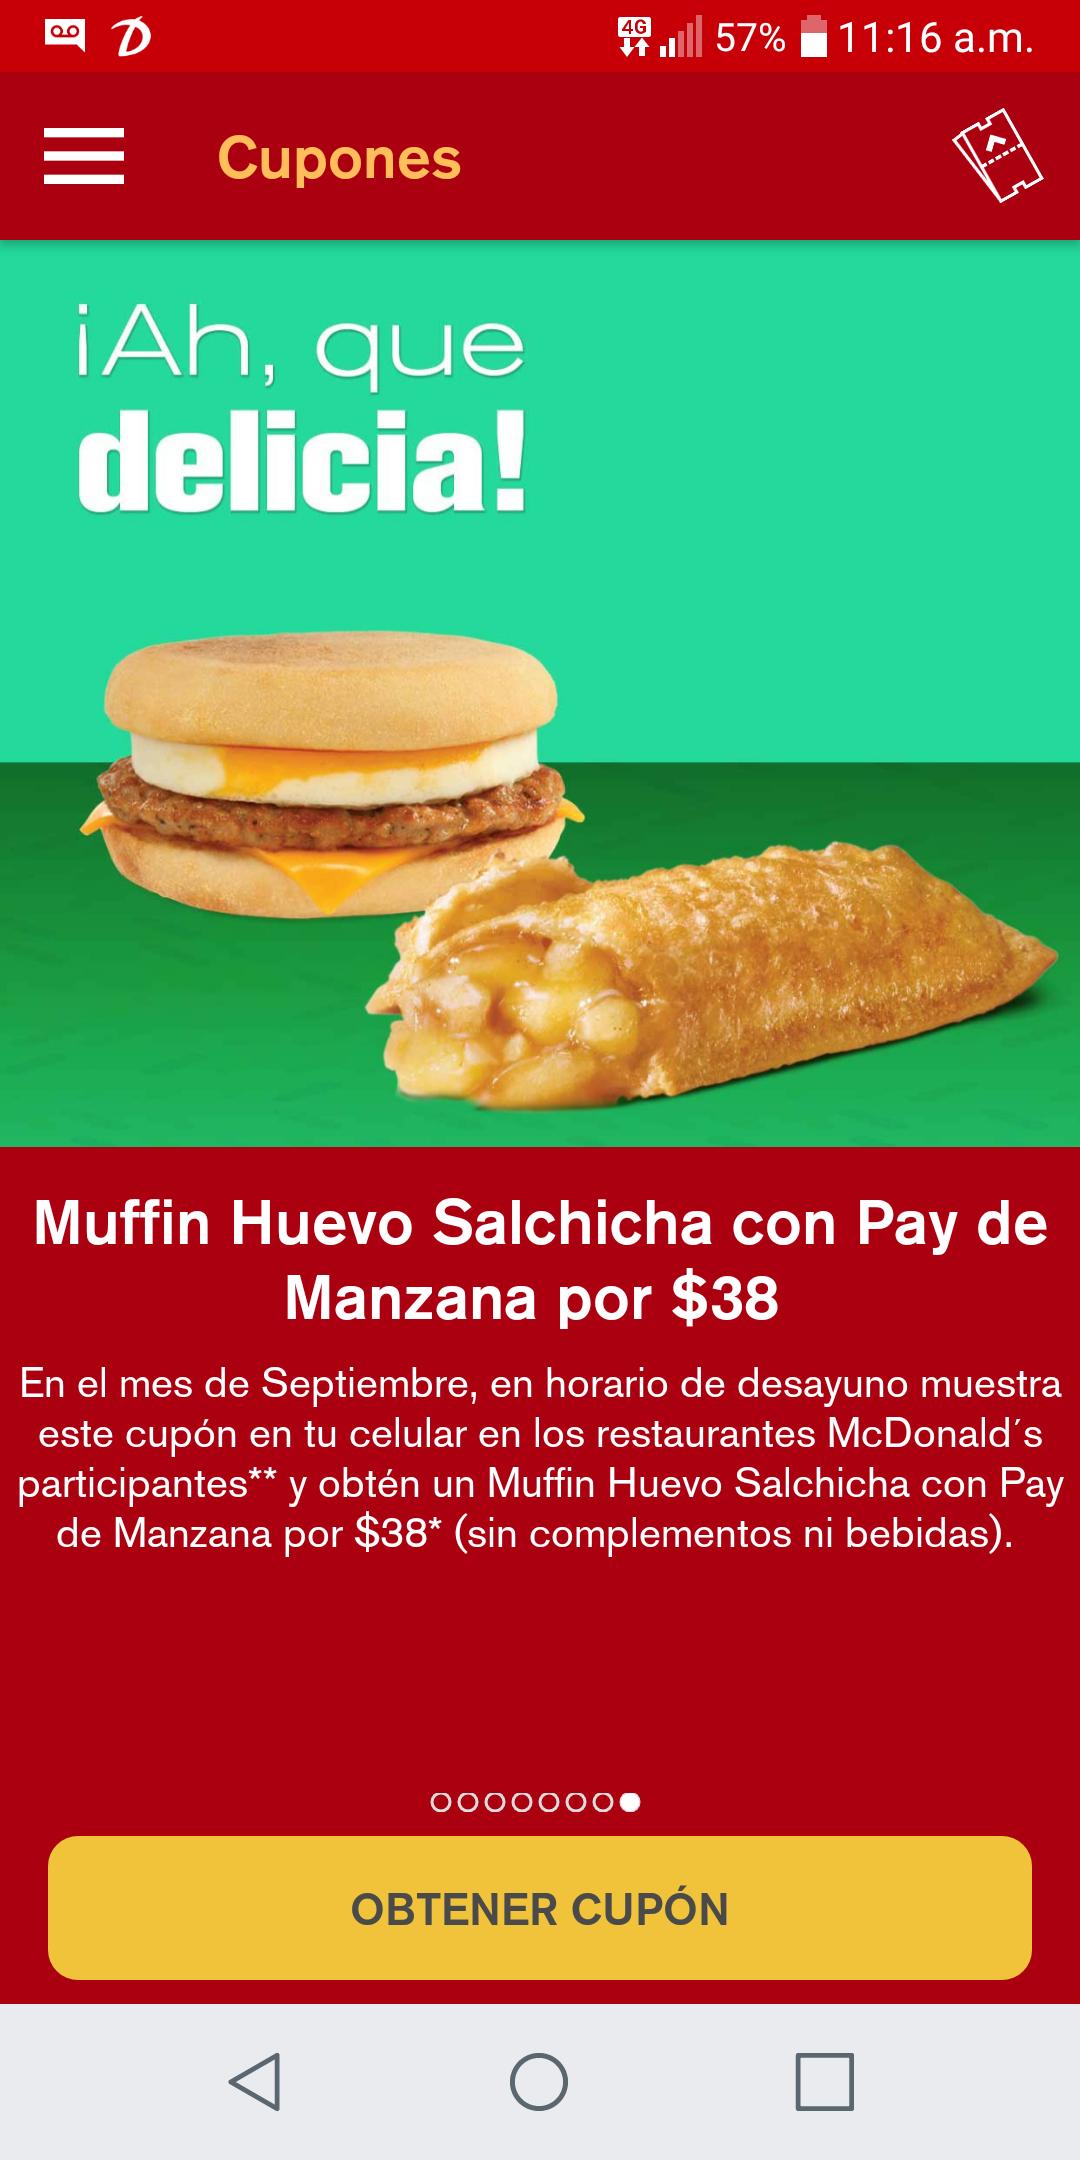 Mc Donald's app: Muffin Huevo Salchicha con pay de manzana